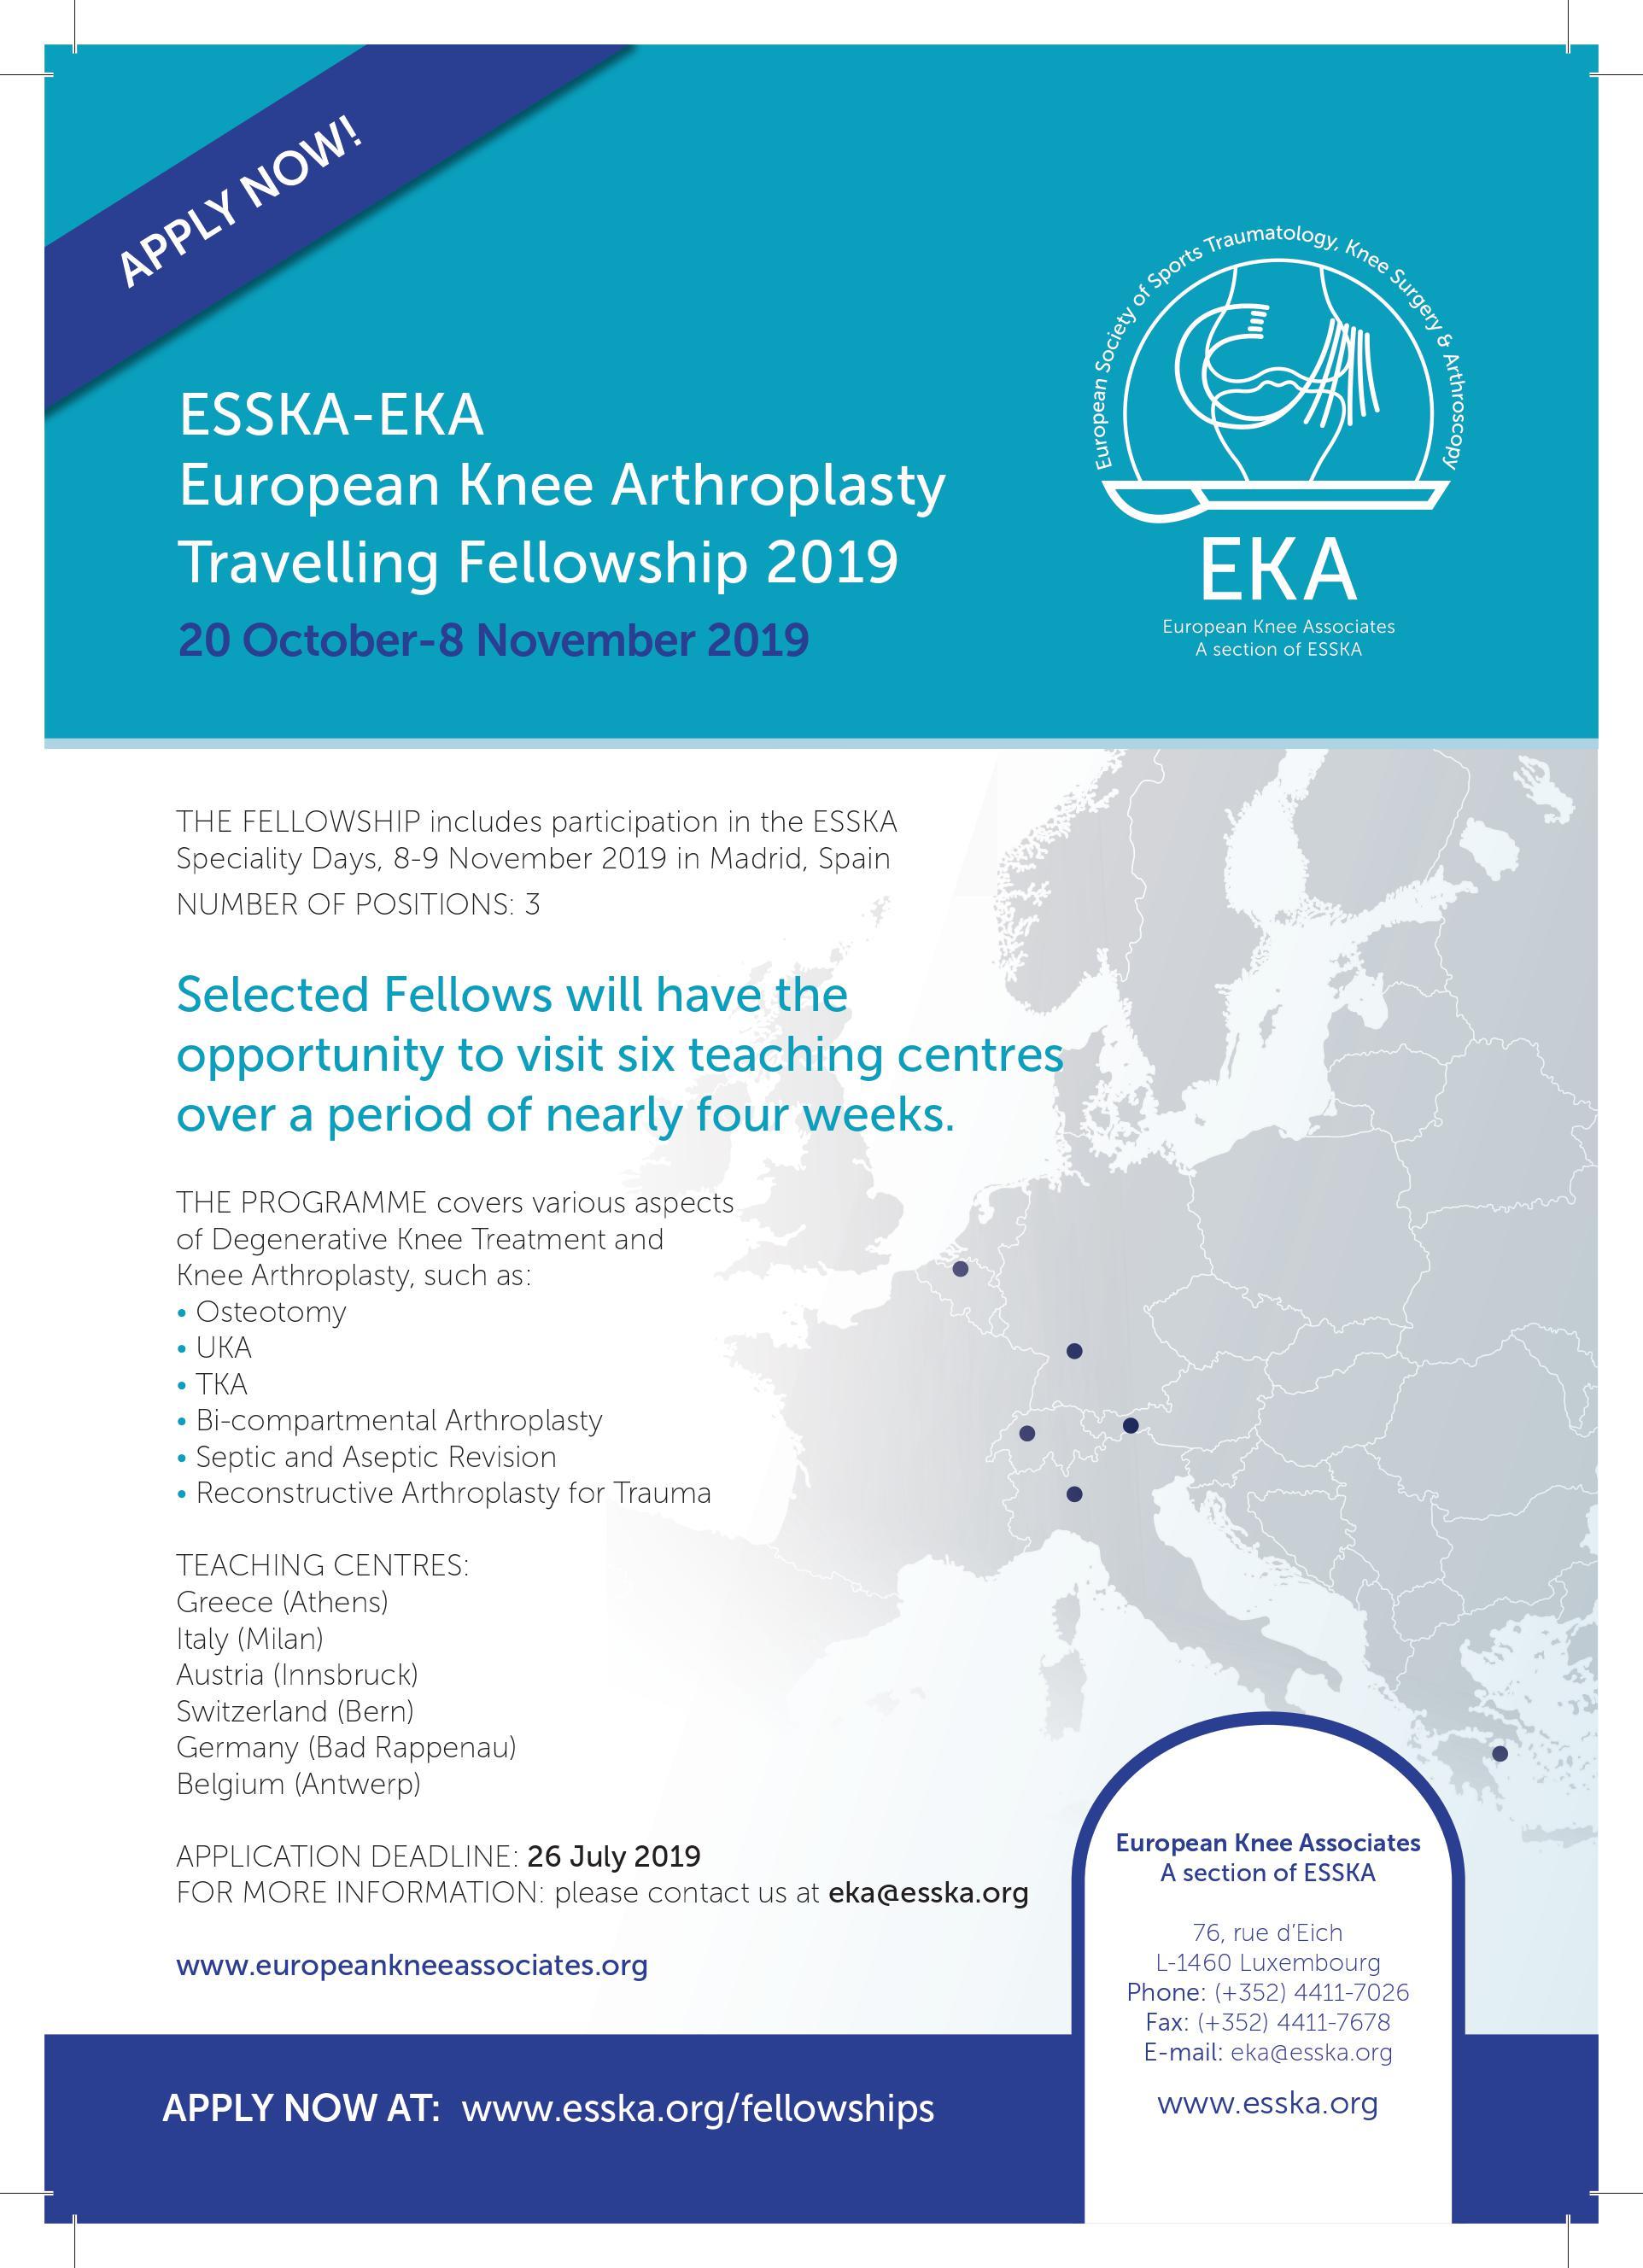 ESSKA-EKA European Knee Arthroplasty Travelling Fellowship 2019